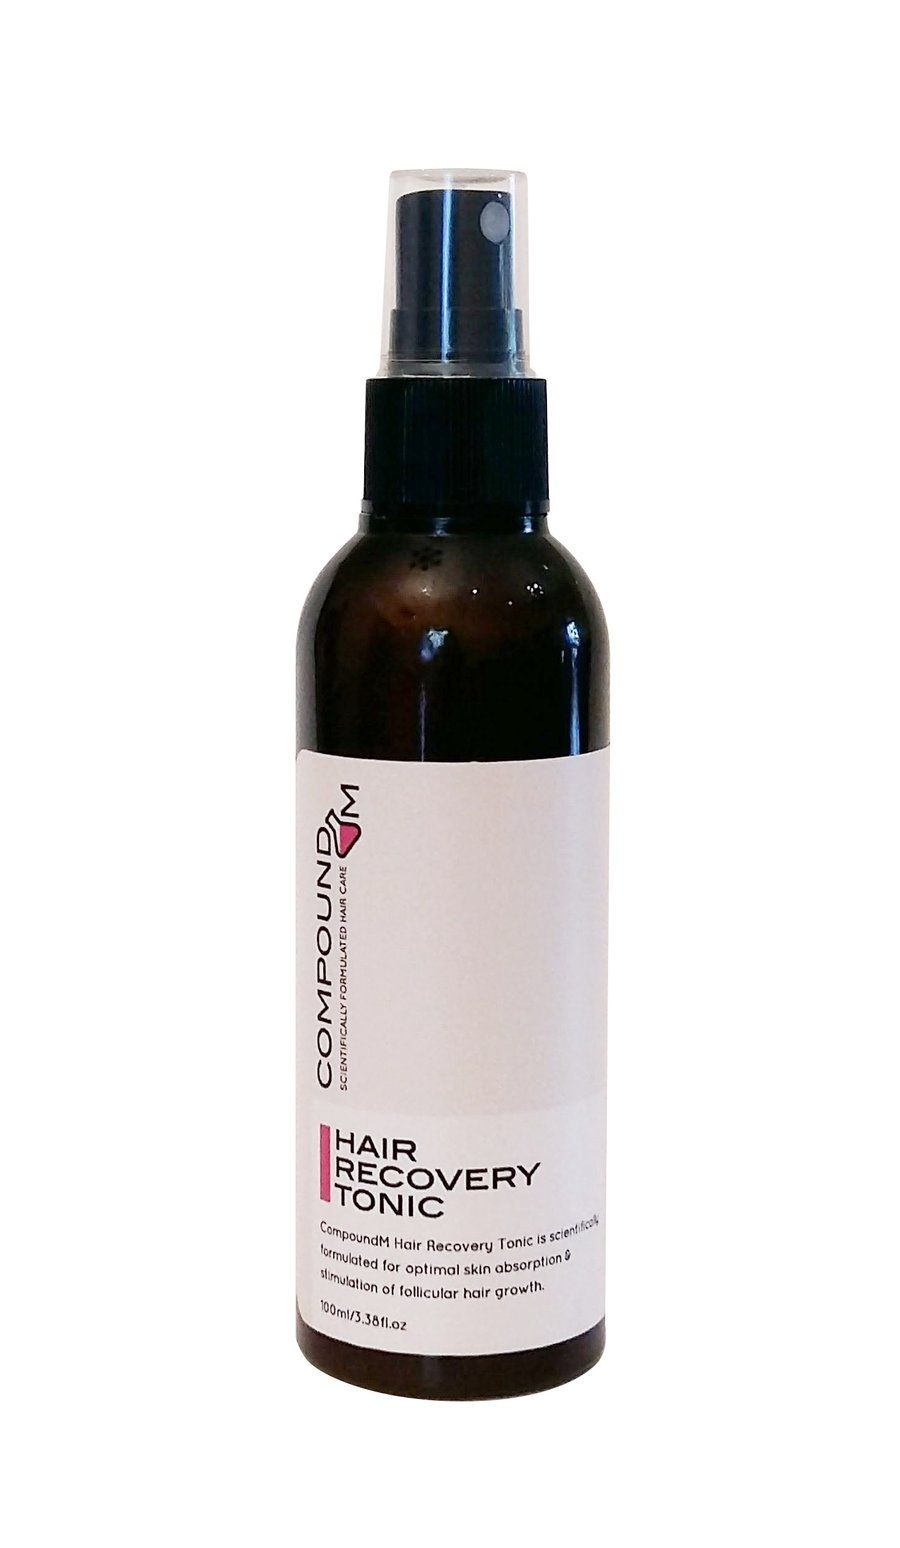 Hair Recovery Tonic 100ml Tonic, Hair regeneration, Hair